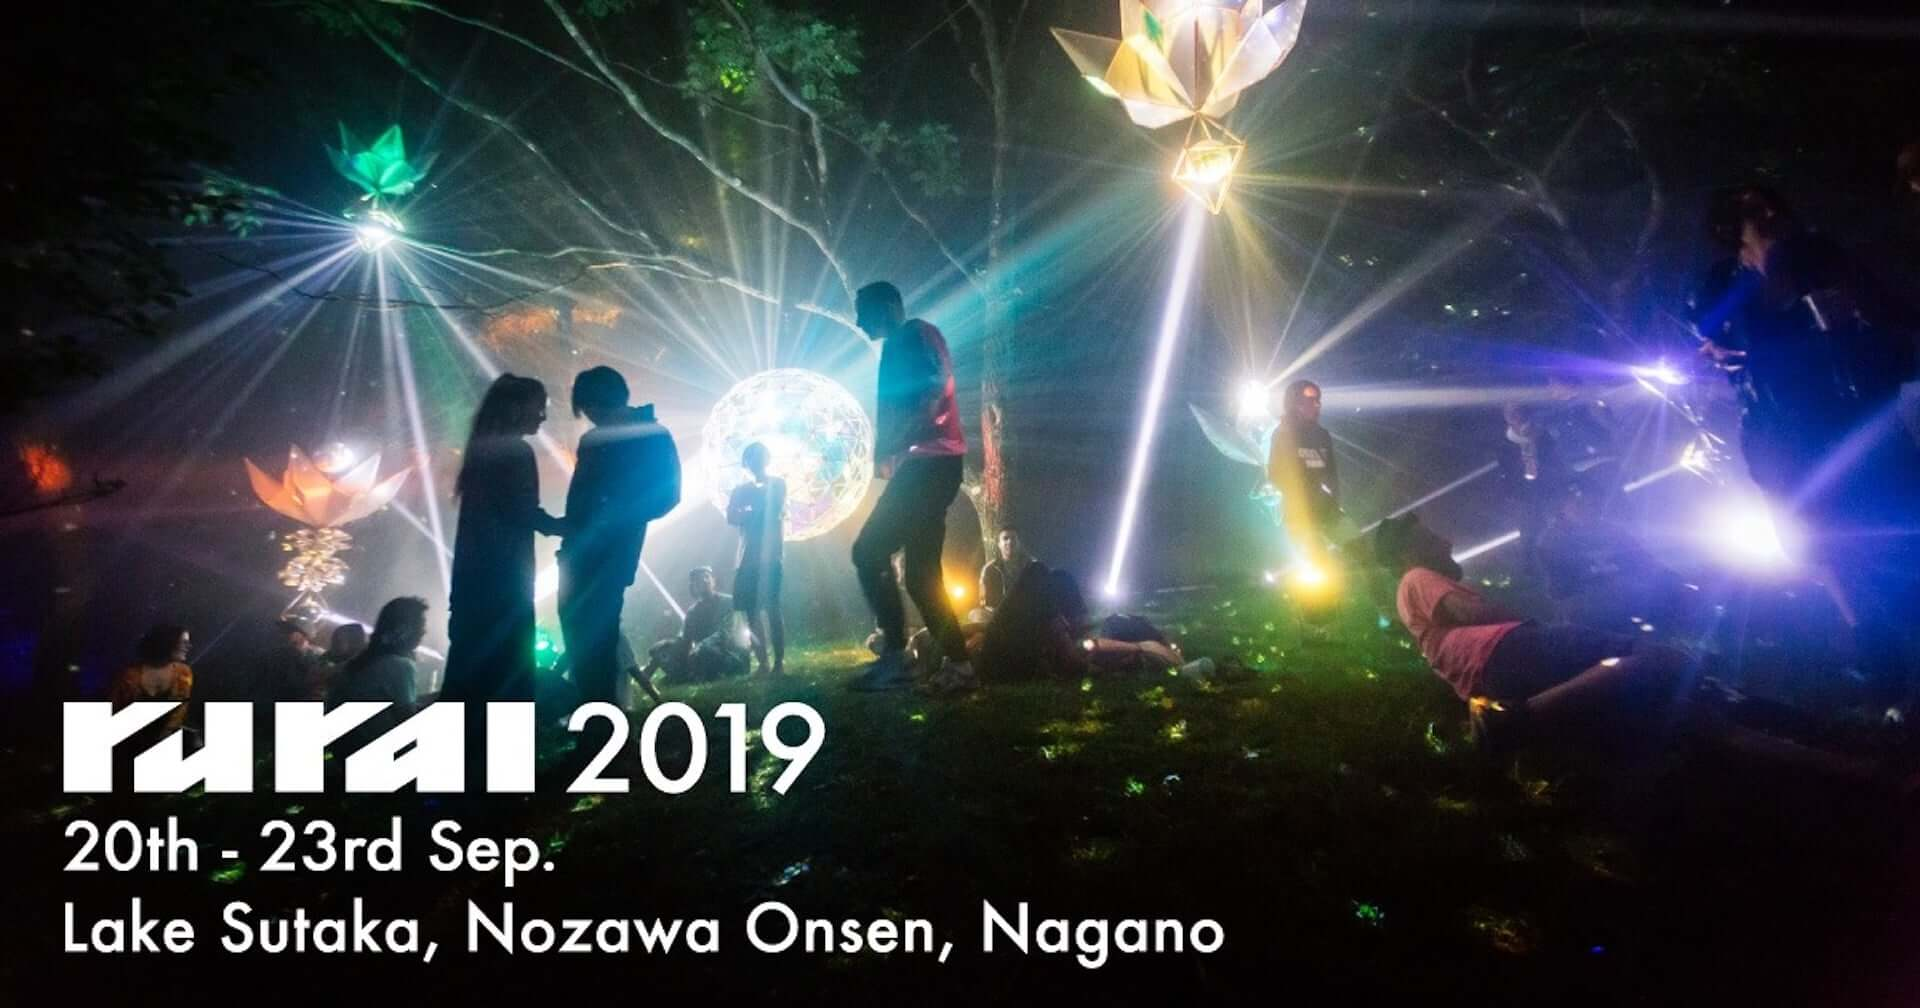 <rural 2019>第1弾ラインナップ&会場マップが発表|Function、Alessandro Cortini、DJ NOBU、Wata Igarashiなどが出演 music190712_rural_2-1920x1008